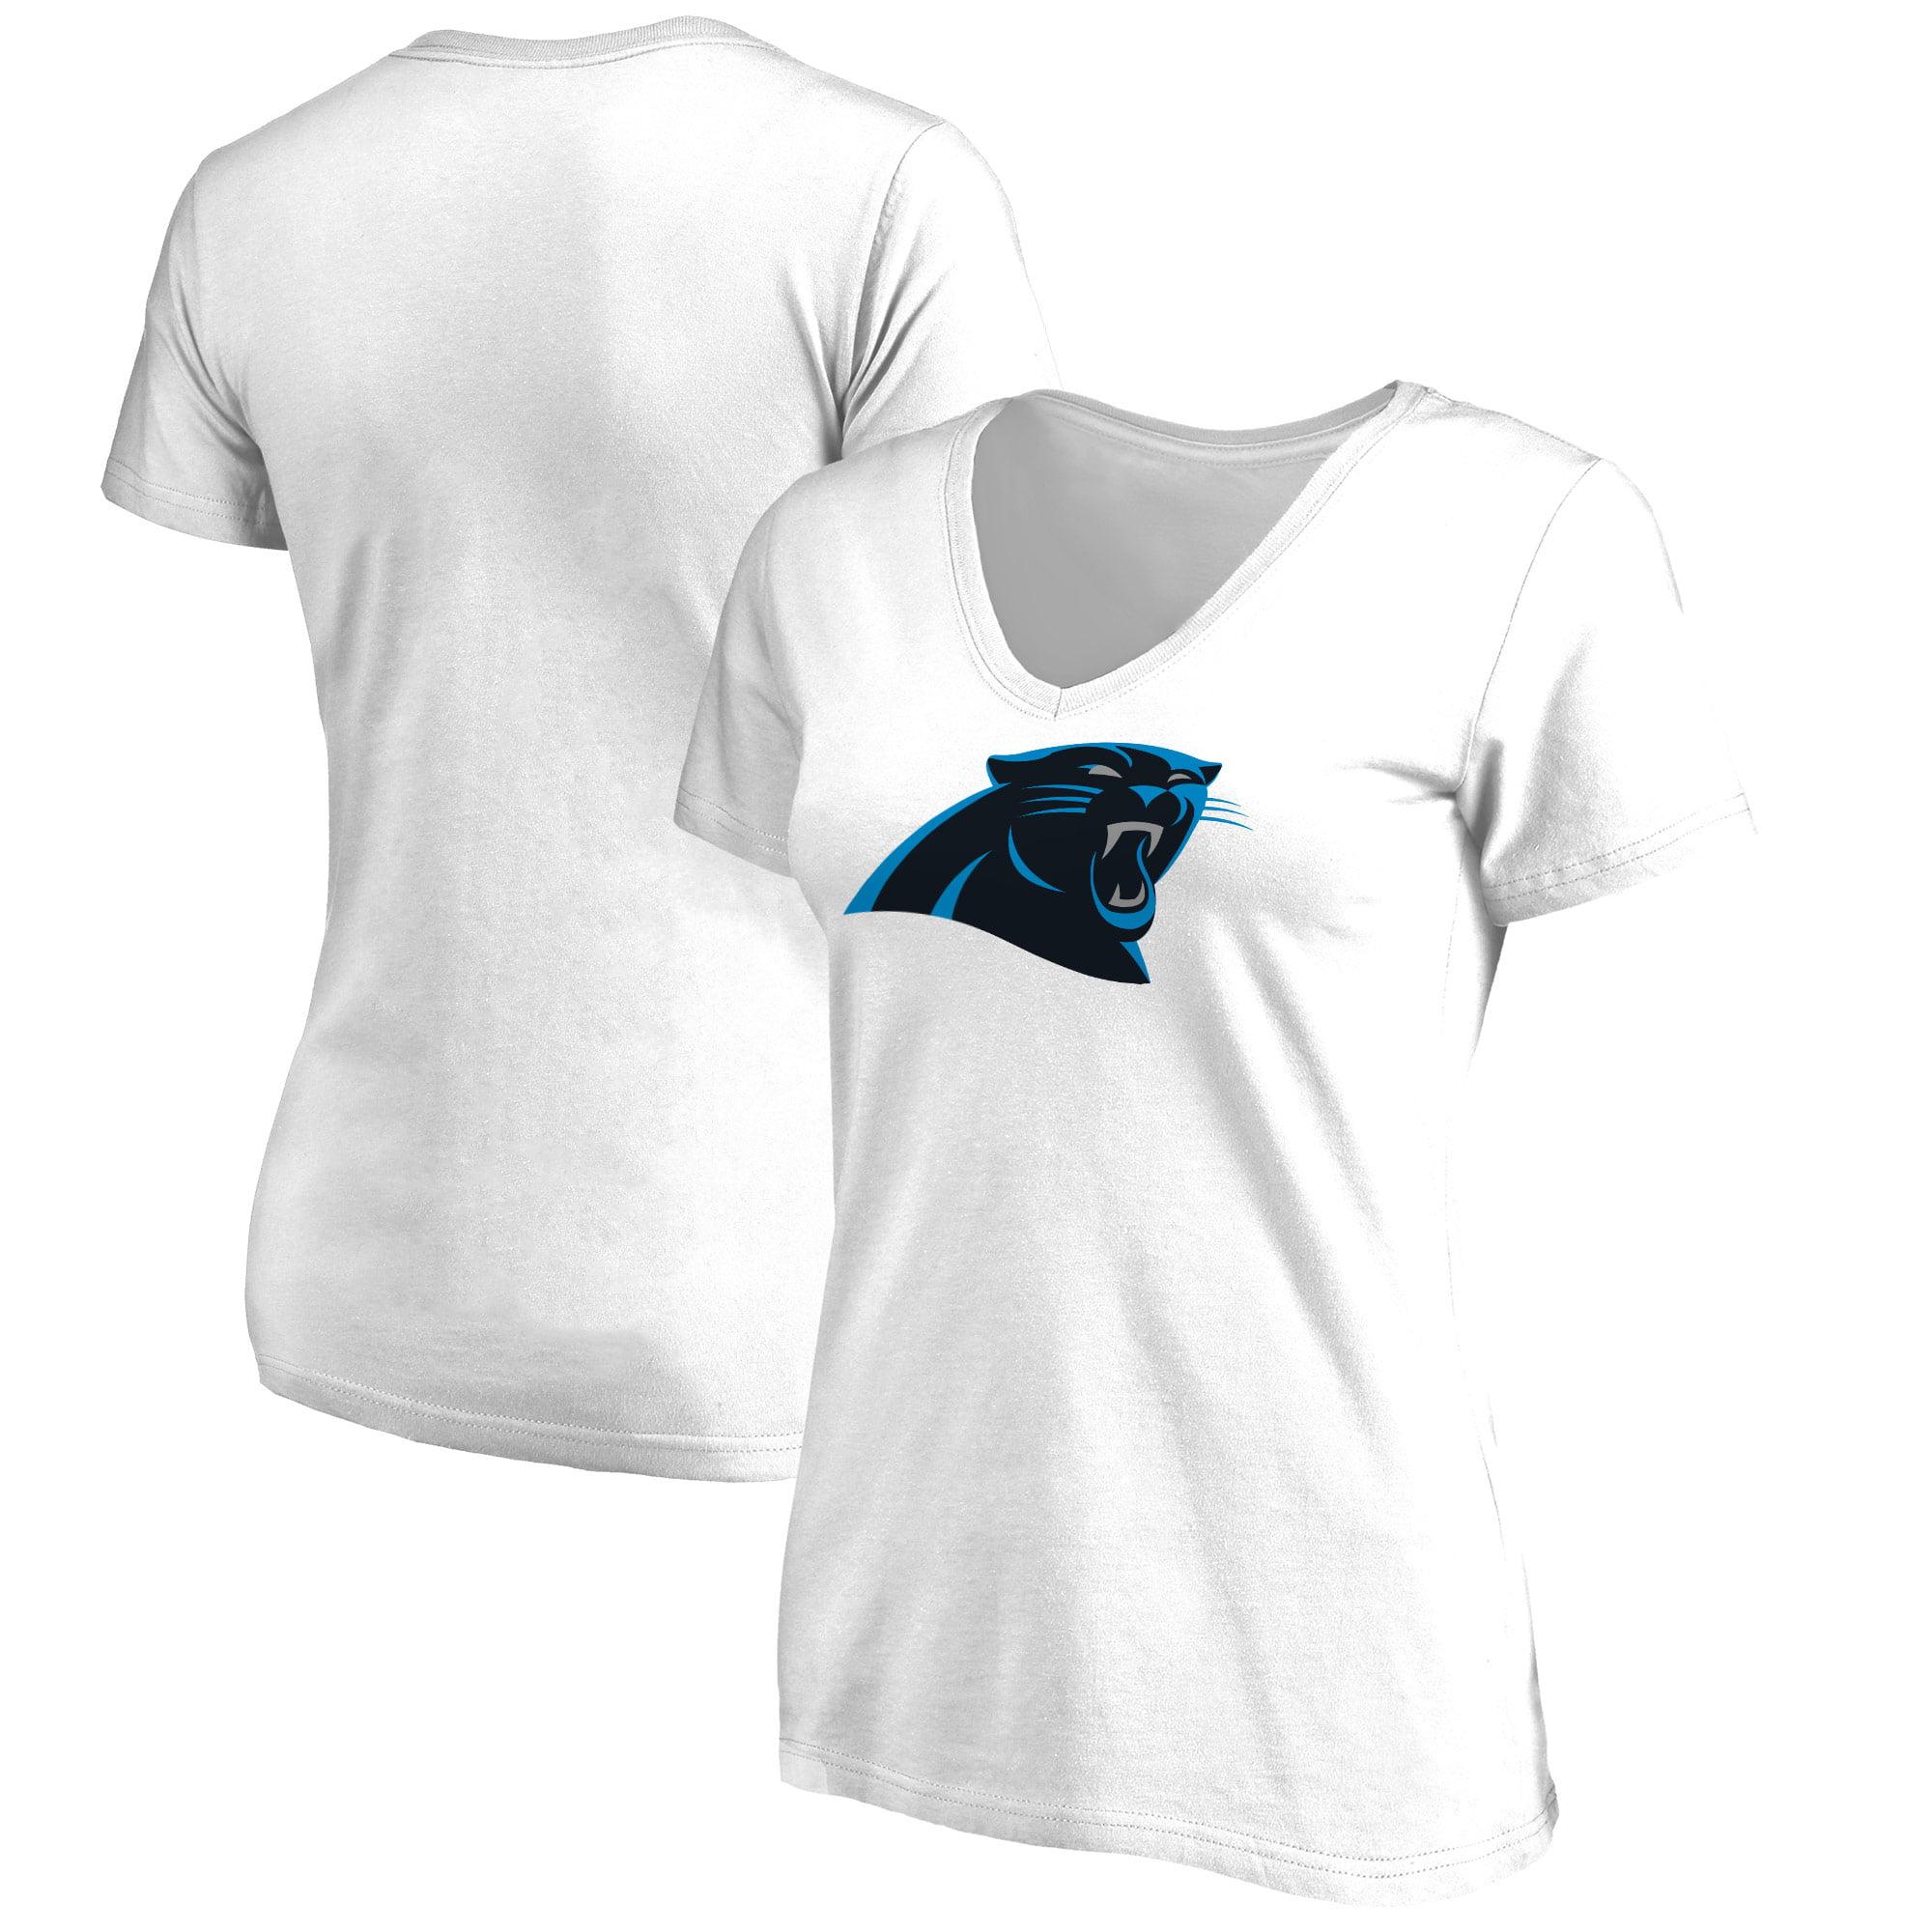 Carolina Panthers NFL Pro Line Women's Plus Size Primary Logo V-Neck T-Shirt - White